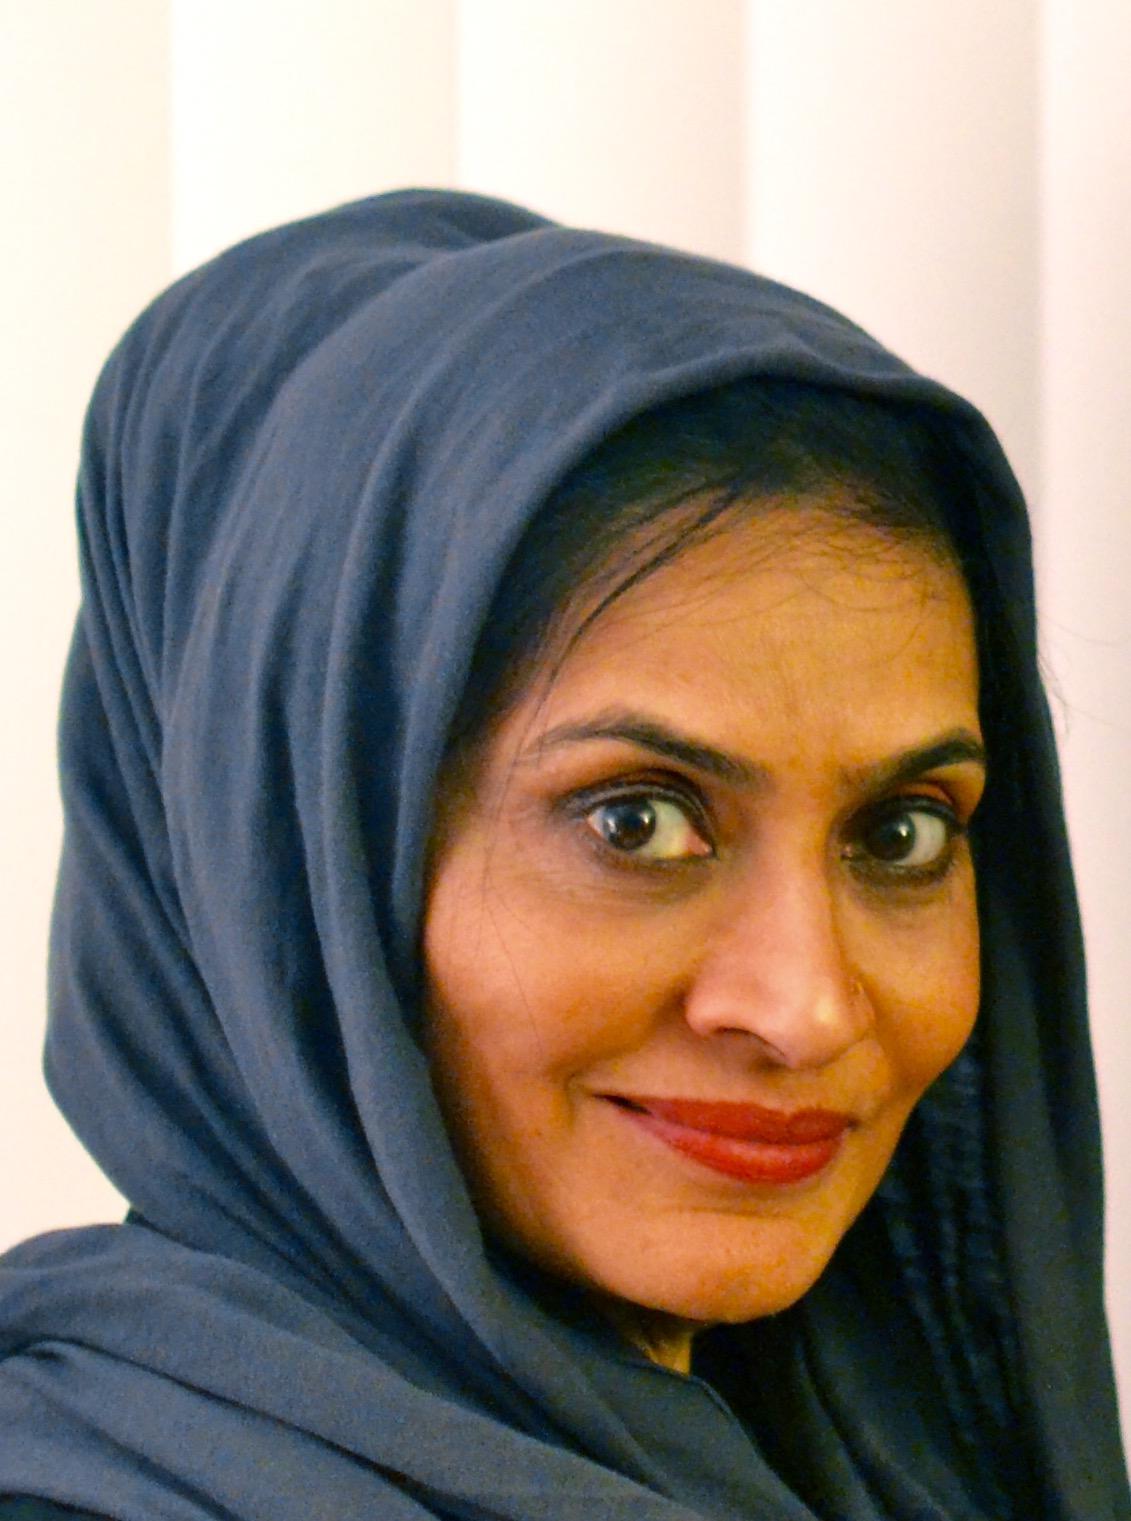 Dr. Yasmeen Khan